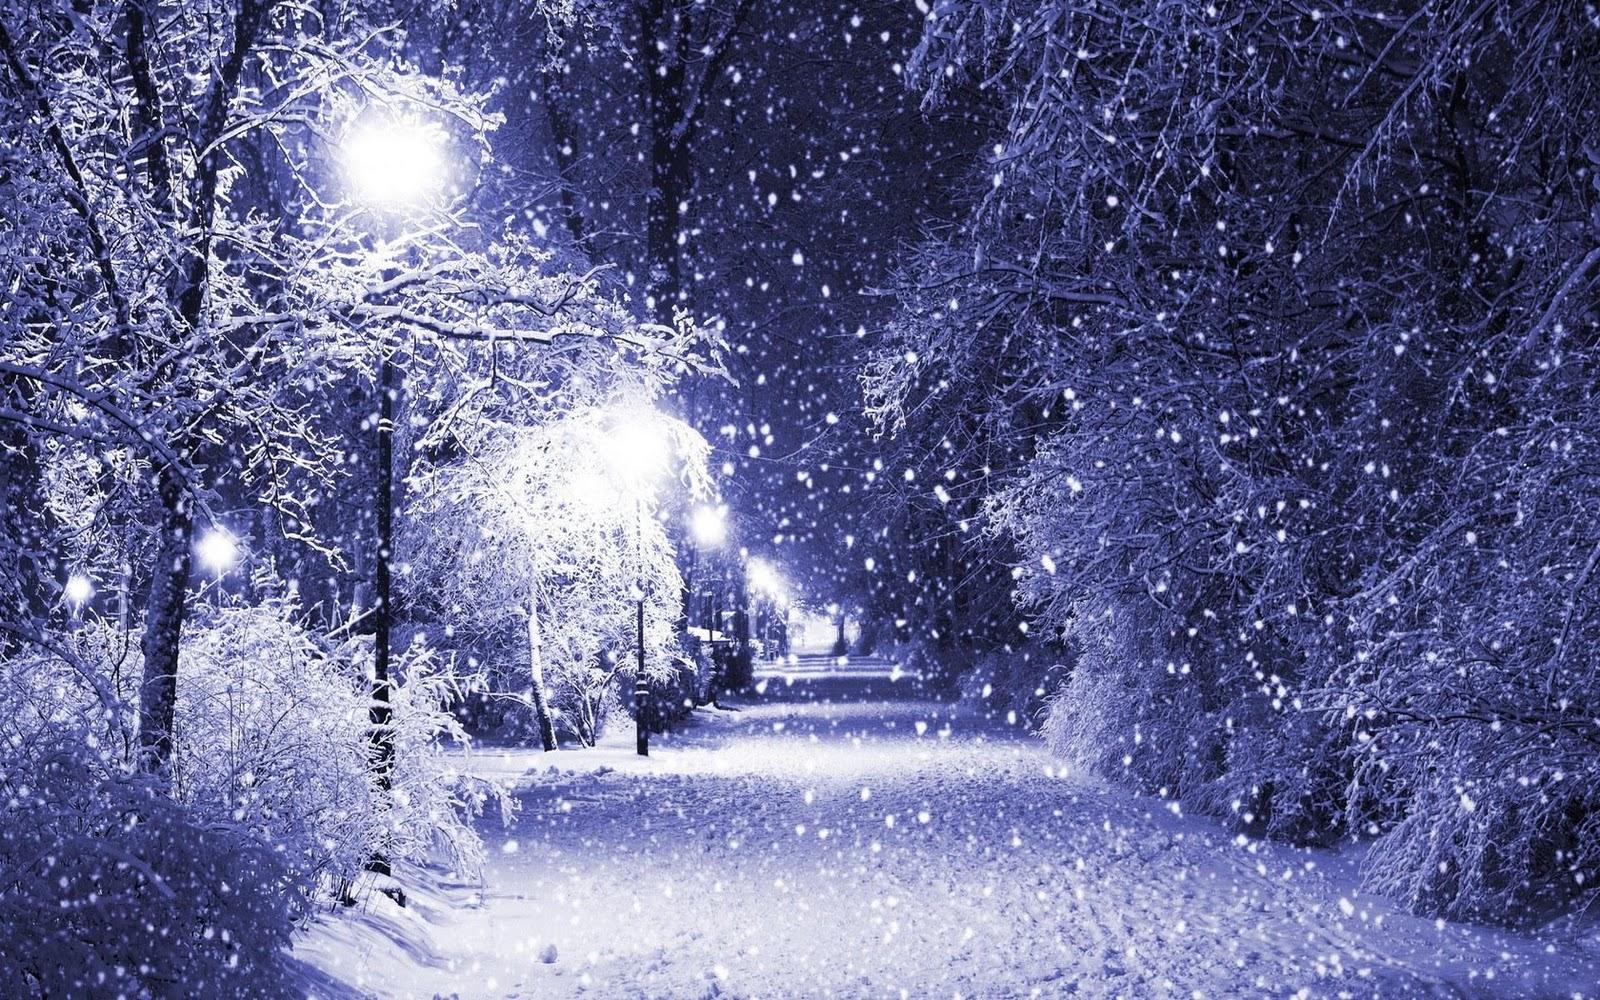 Winter Scenes Desktop Wallpaper Posted By Ethan Johnson